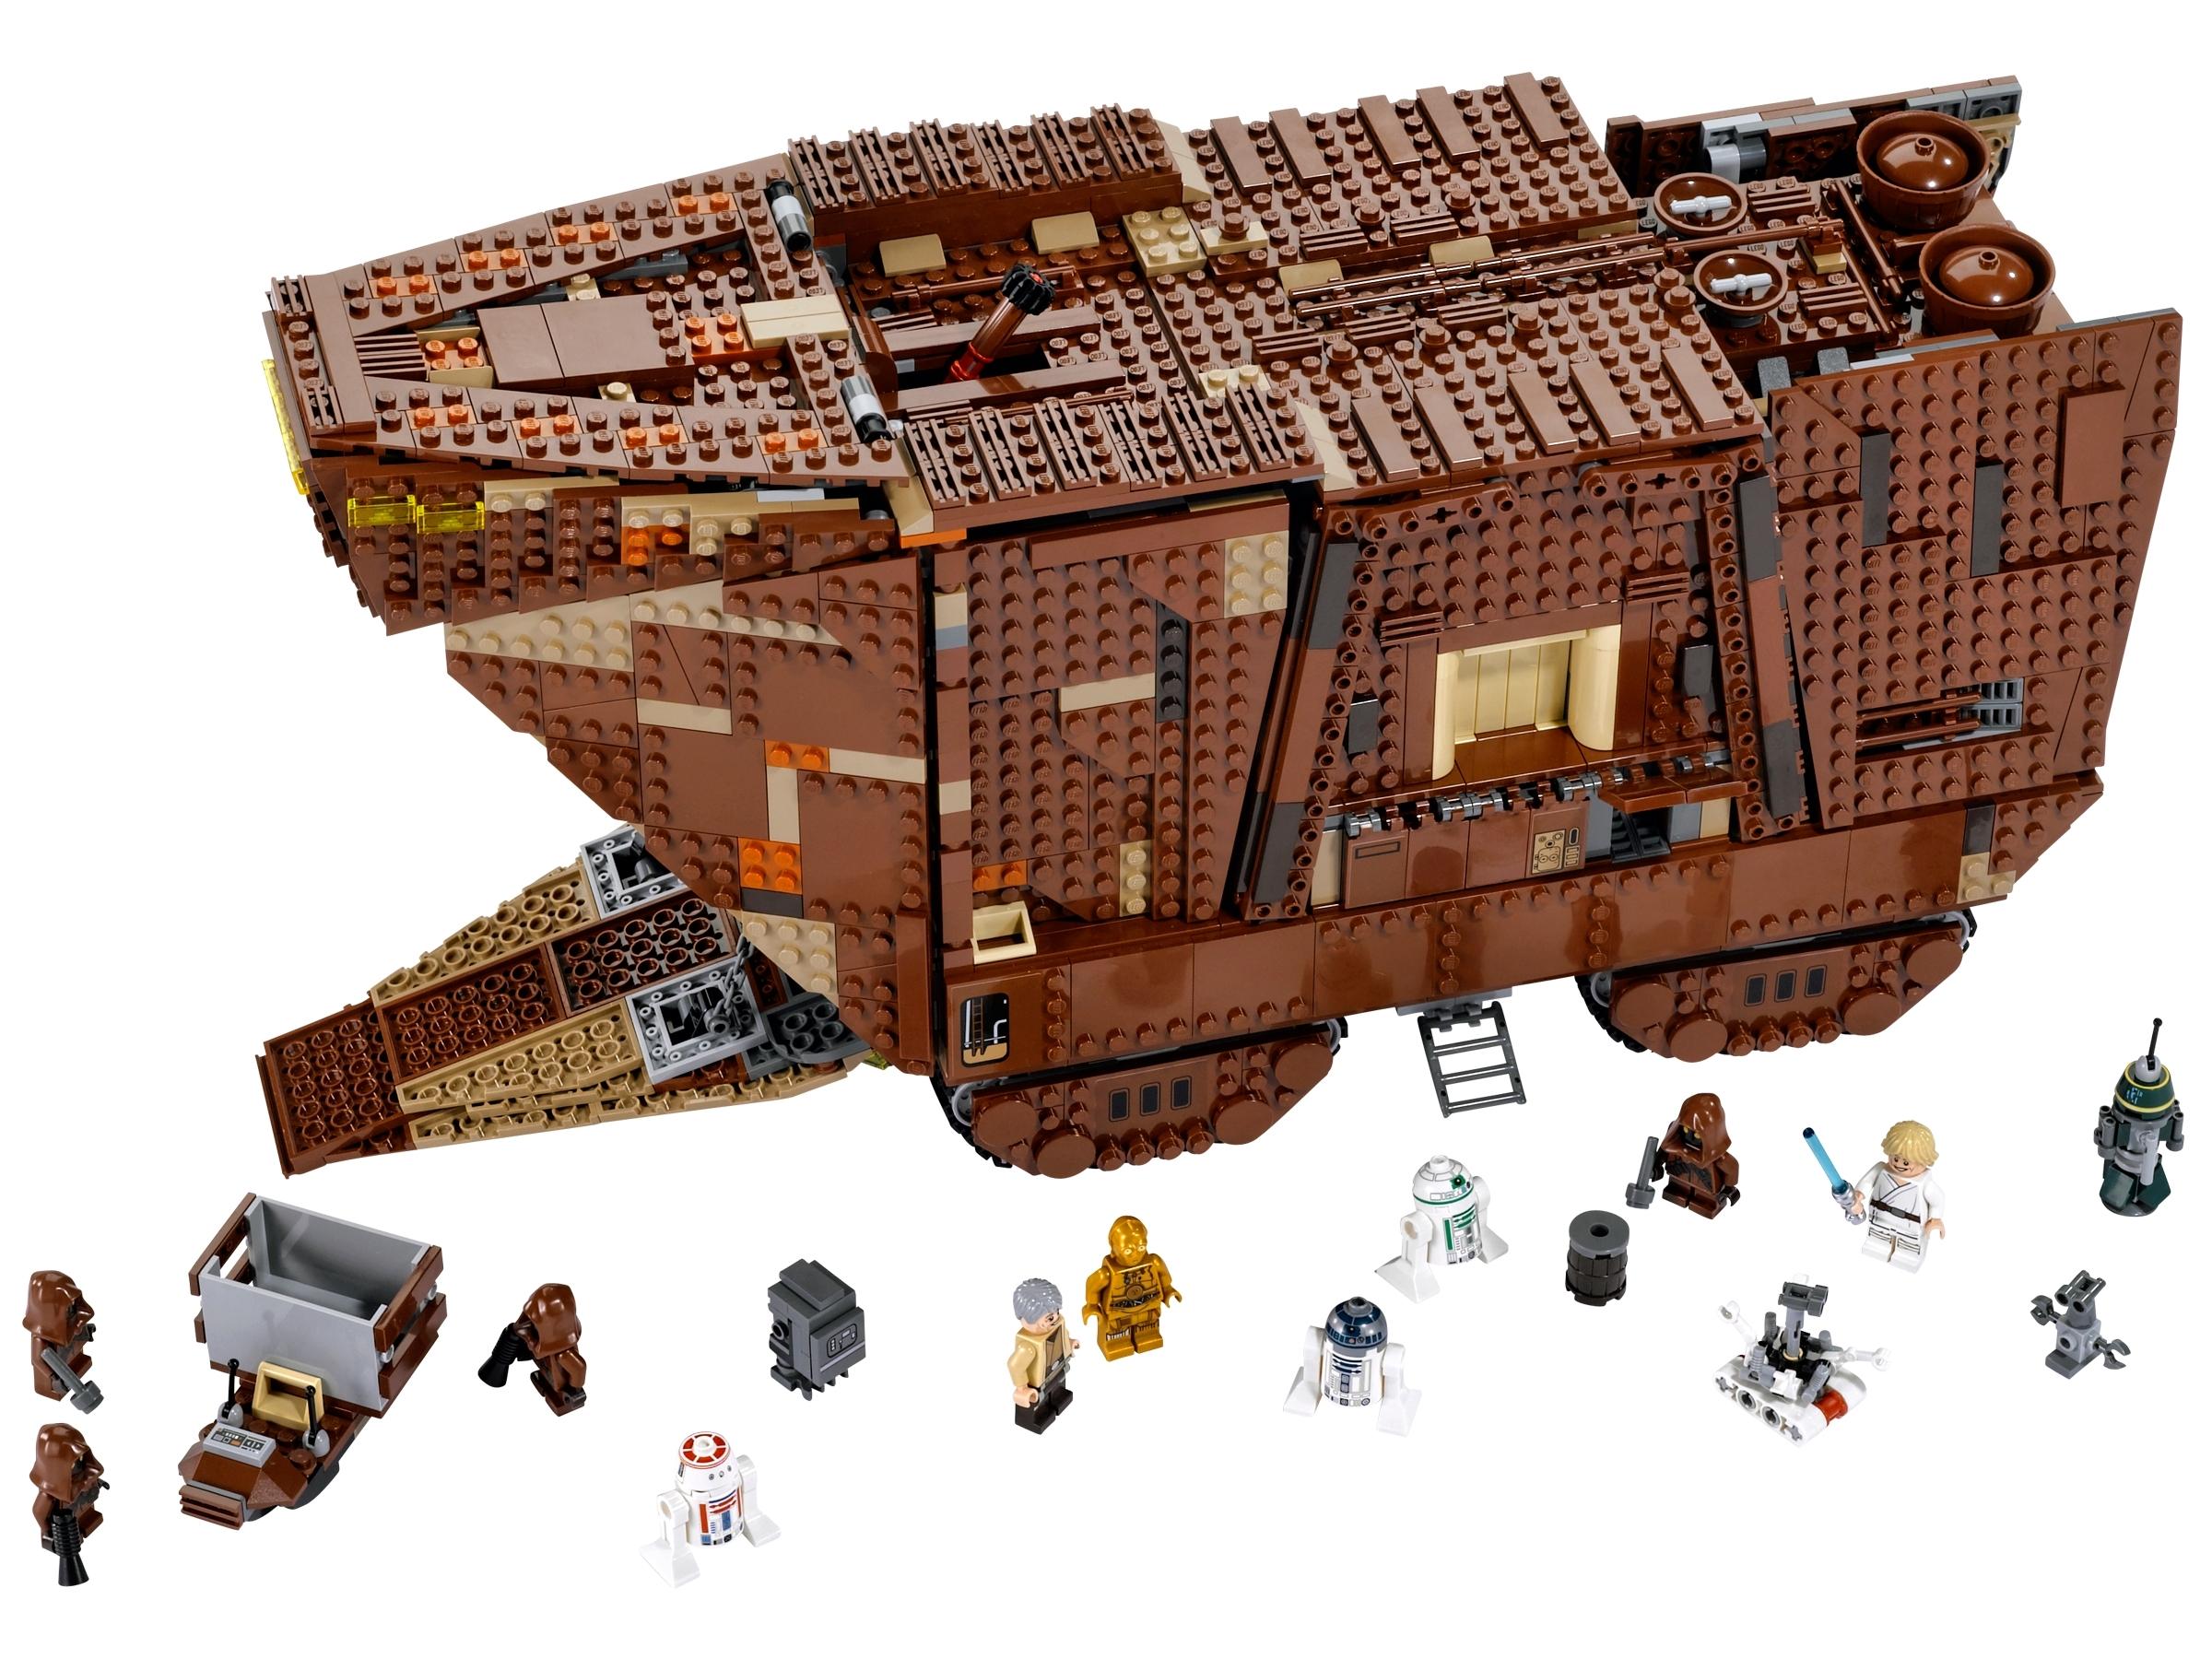 NEW RARE LEGO OWEN LARS MINIFIGURE STAR WARS SANDCRAWLER 75059 SET